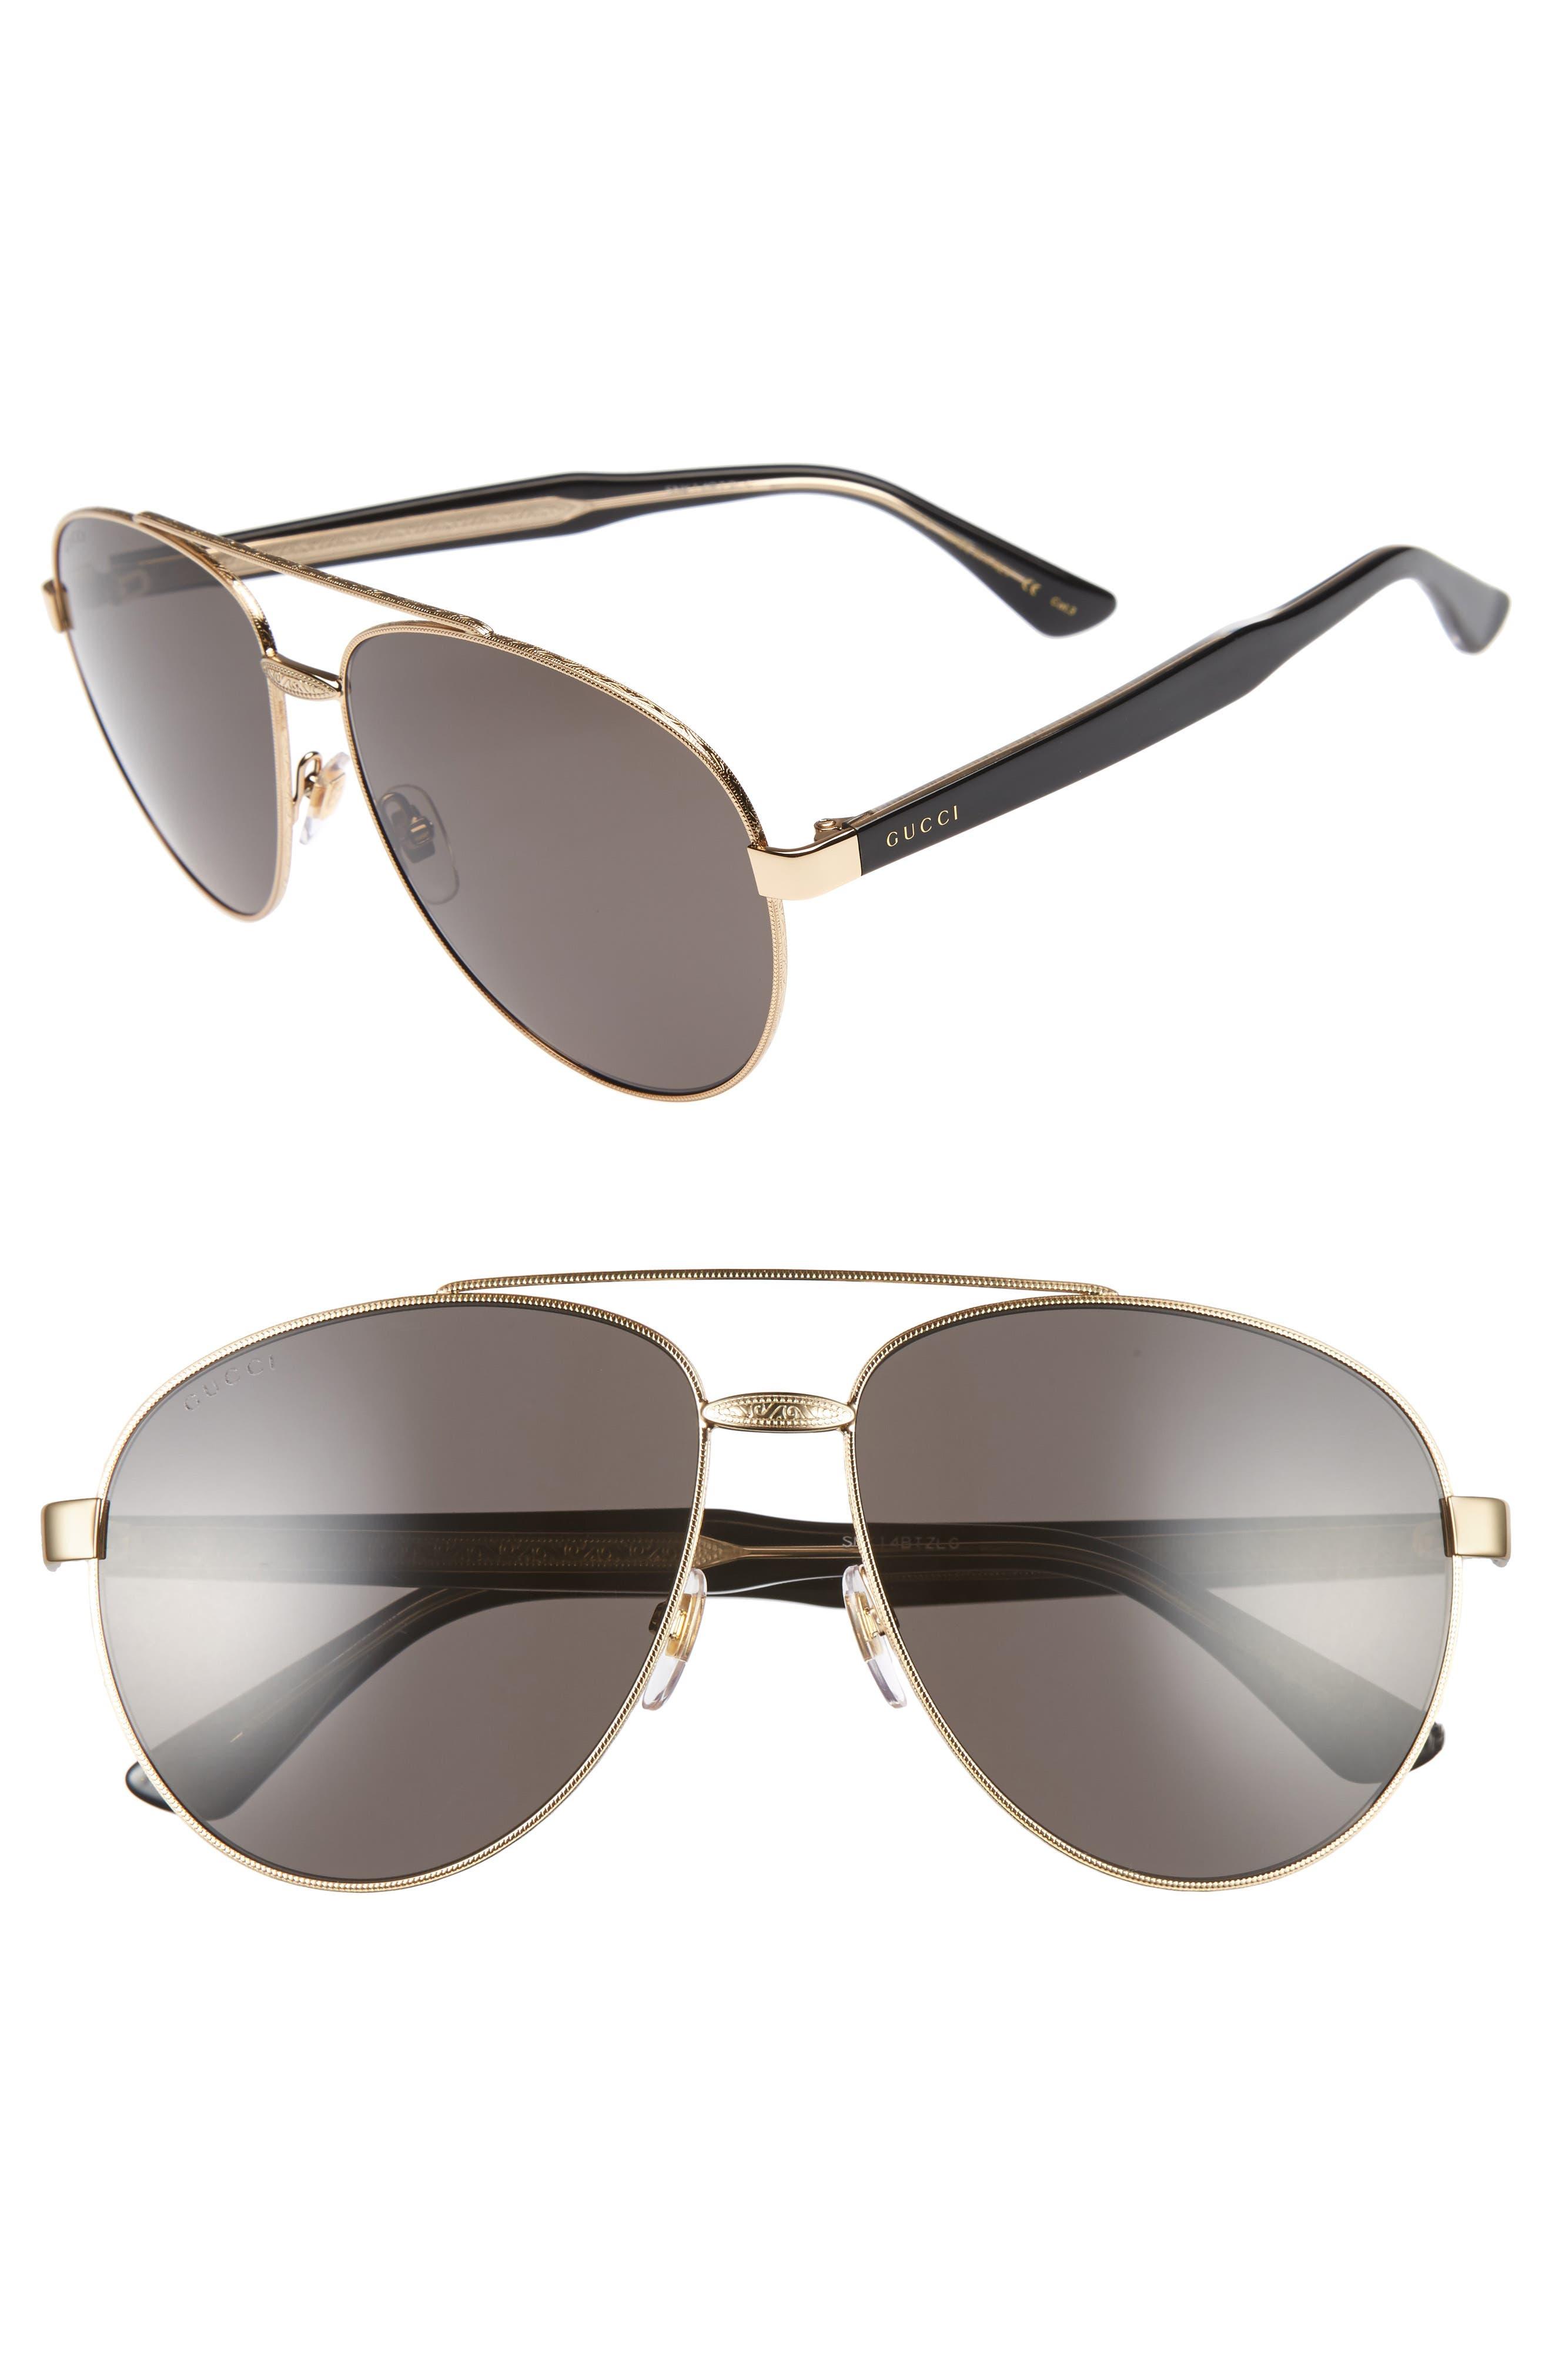 61mm Aviator Sunglasses,                             Alternate thumbnail 2, color,                             710